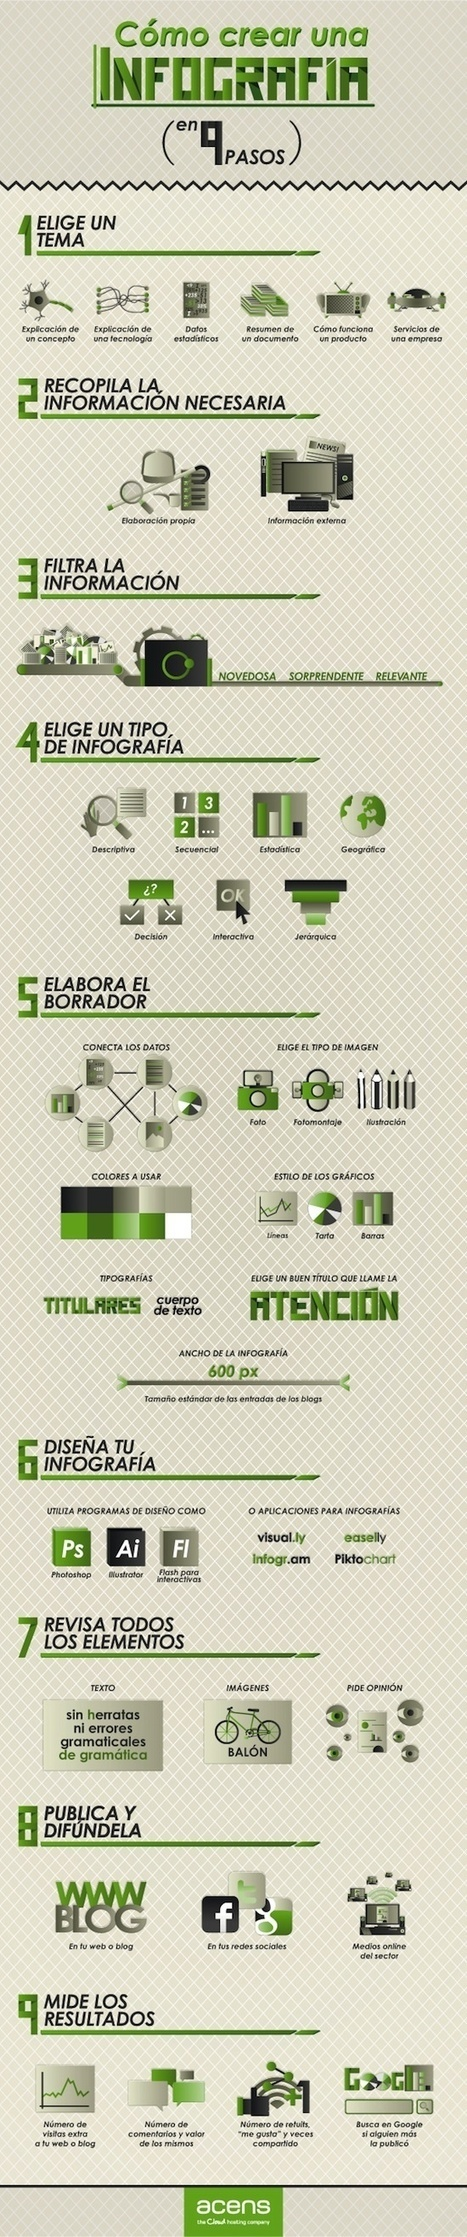 Infografias | Recursos para hacer infografías | Scoop.it